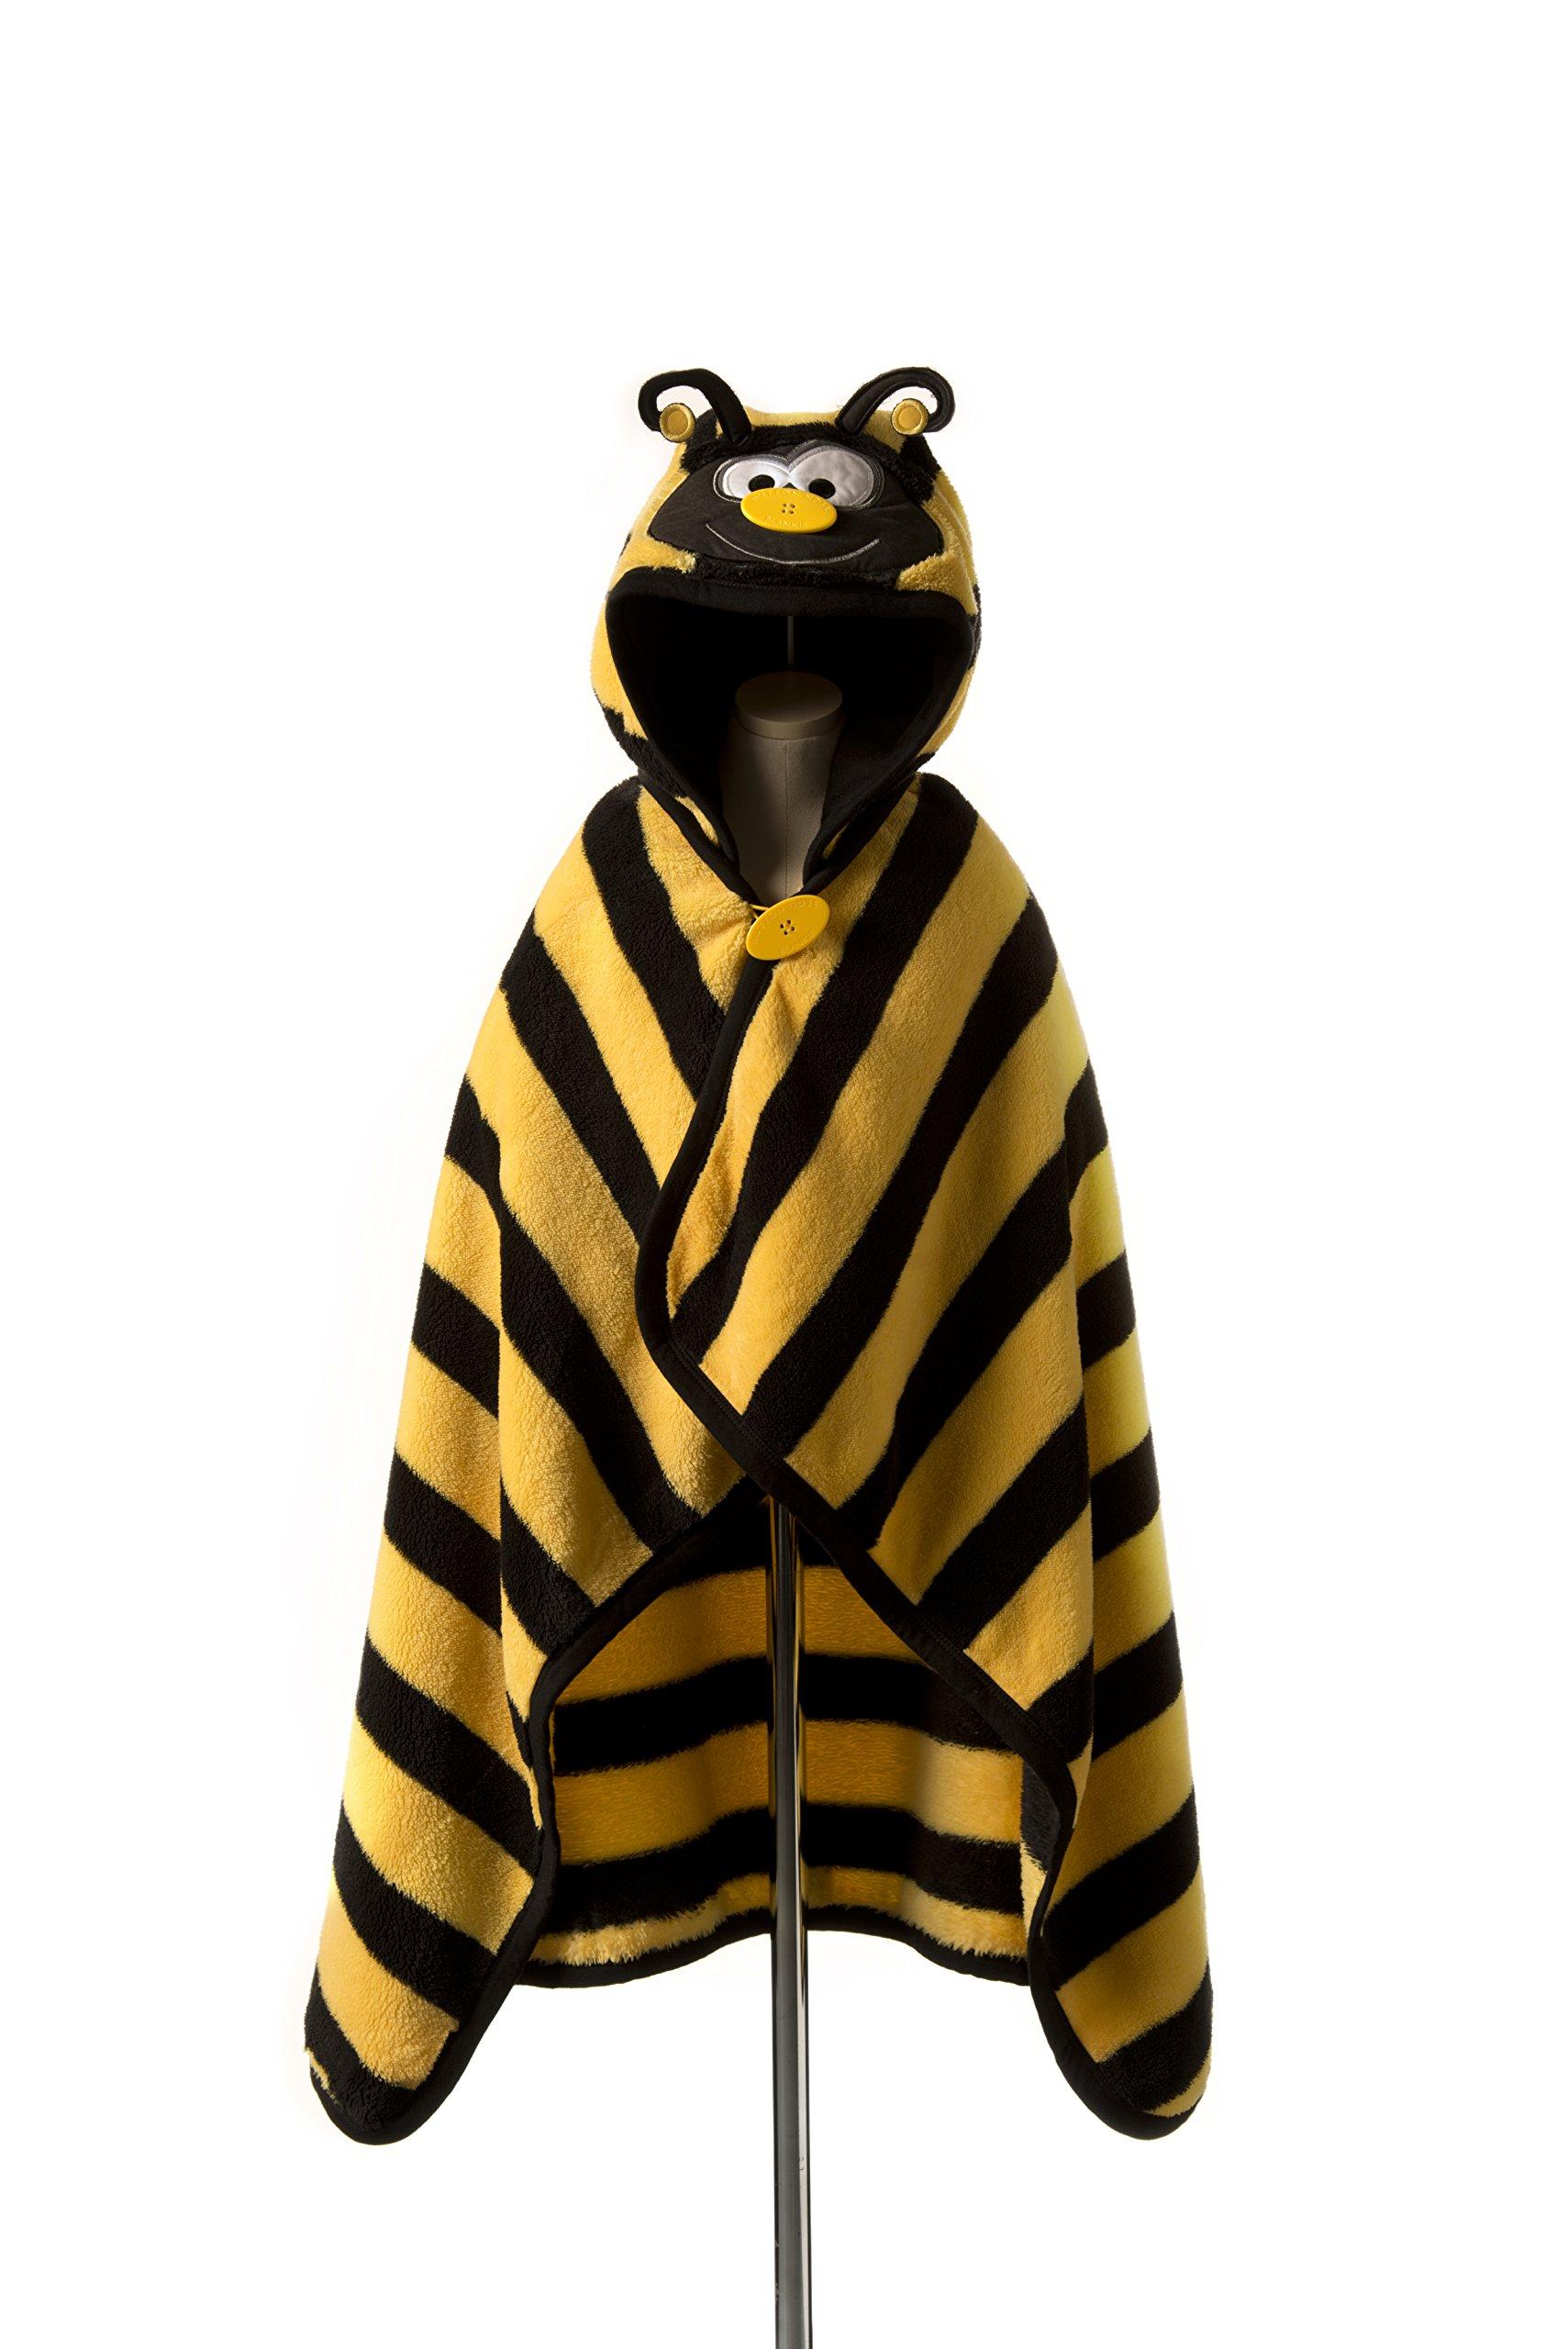 Goo-Goo Baby Button Nose Kid's Hooded Blanket and Towel, Warm Soft Fleece Character Blanket, Bumble Bee, 0-10 Years